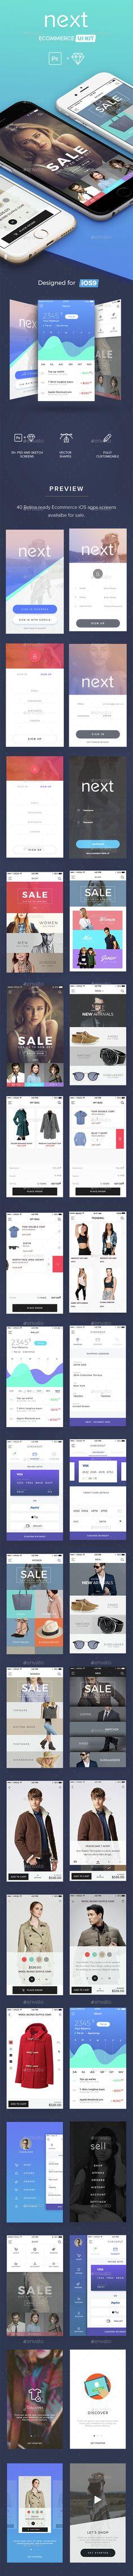 Next E-commerce UI Kit (User Interfaces)